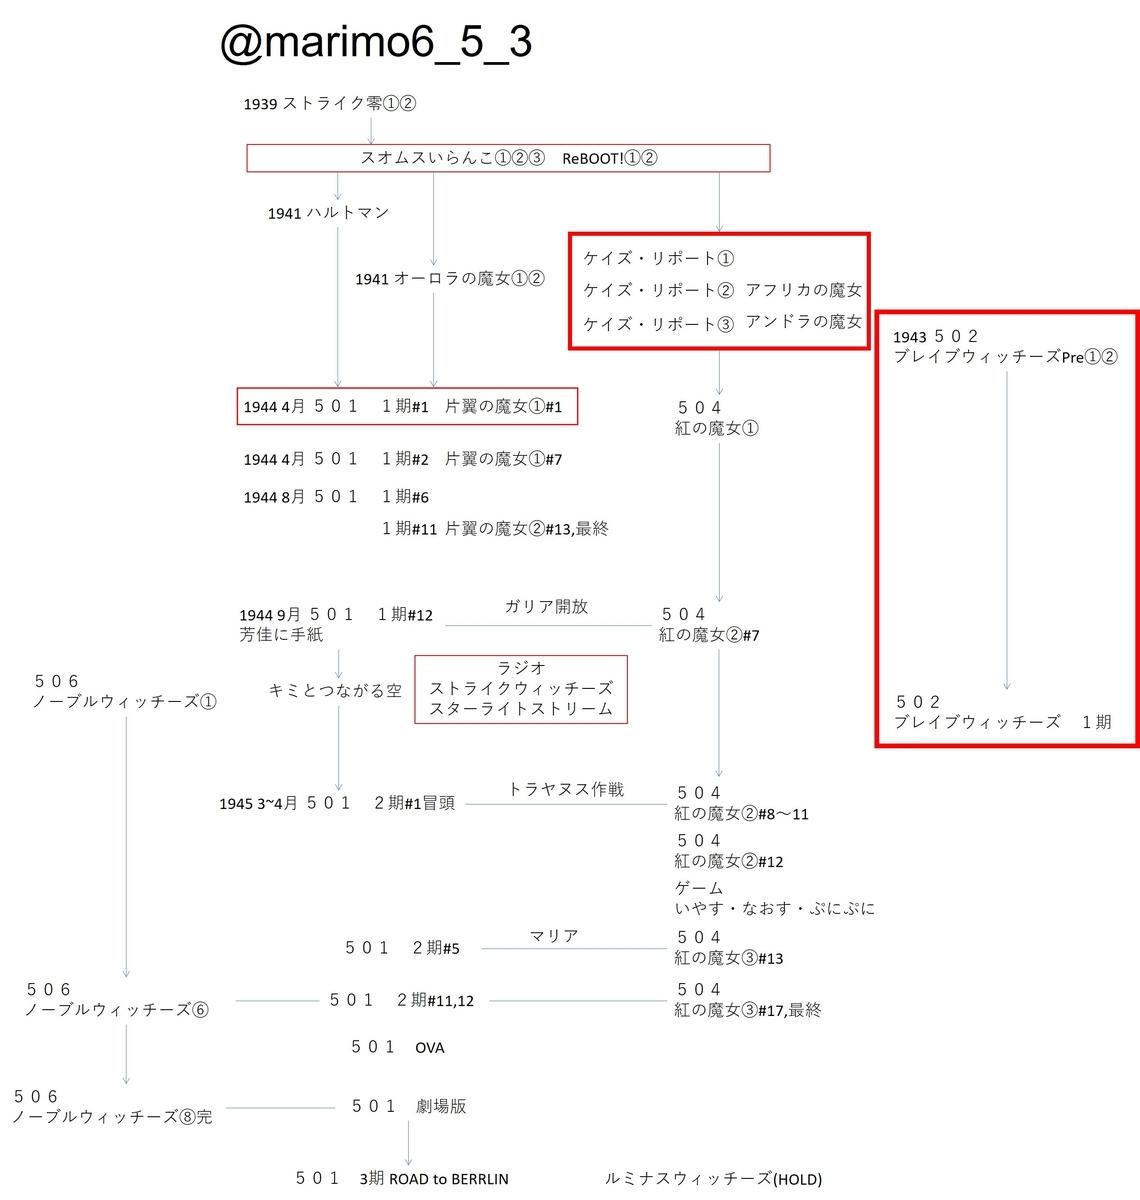 f:id:marimo-pokemon-marimokojo:20190331104110j:plain